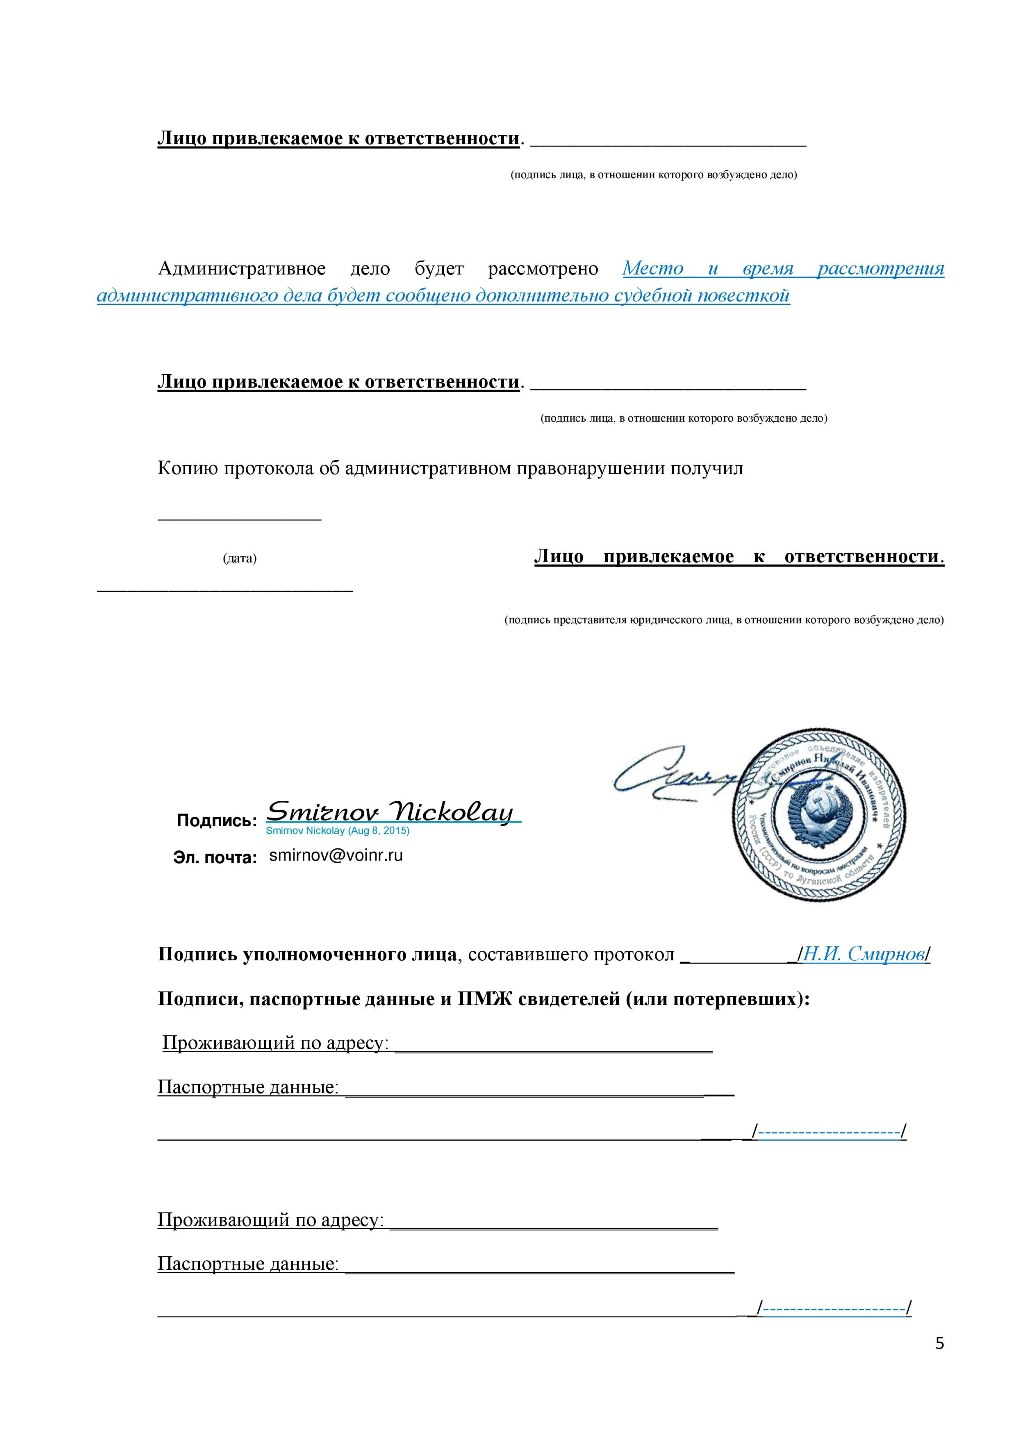 http://narsud-sssr.ru/wp-content/uploads/2015/08/page5.jpg